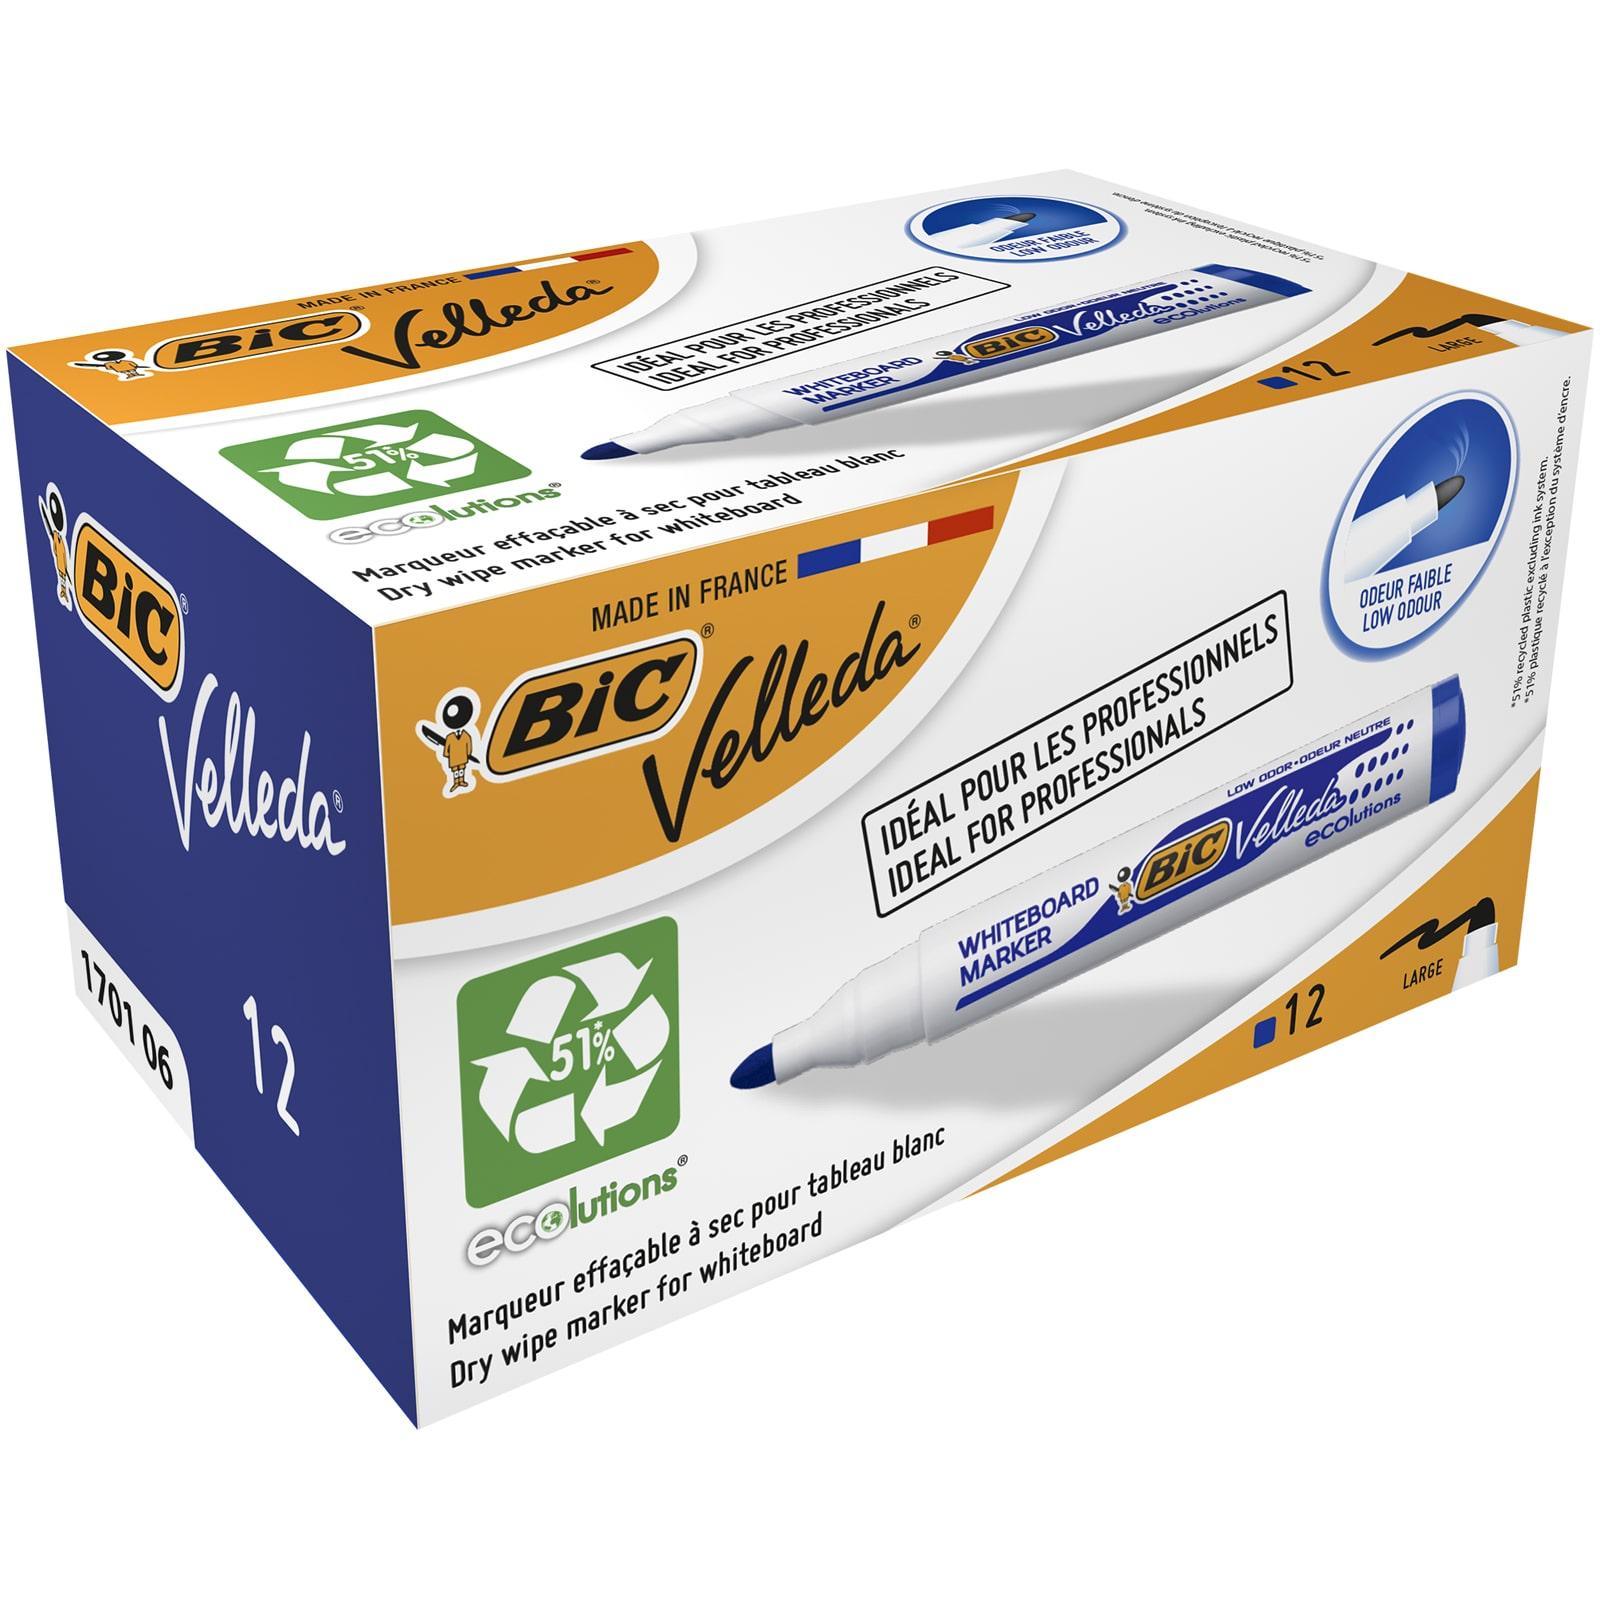 BIC VELLEDA 1701 - Pack de 12 marqueurs effaçables - pointe ogive - bleu